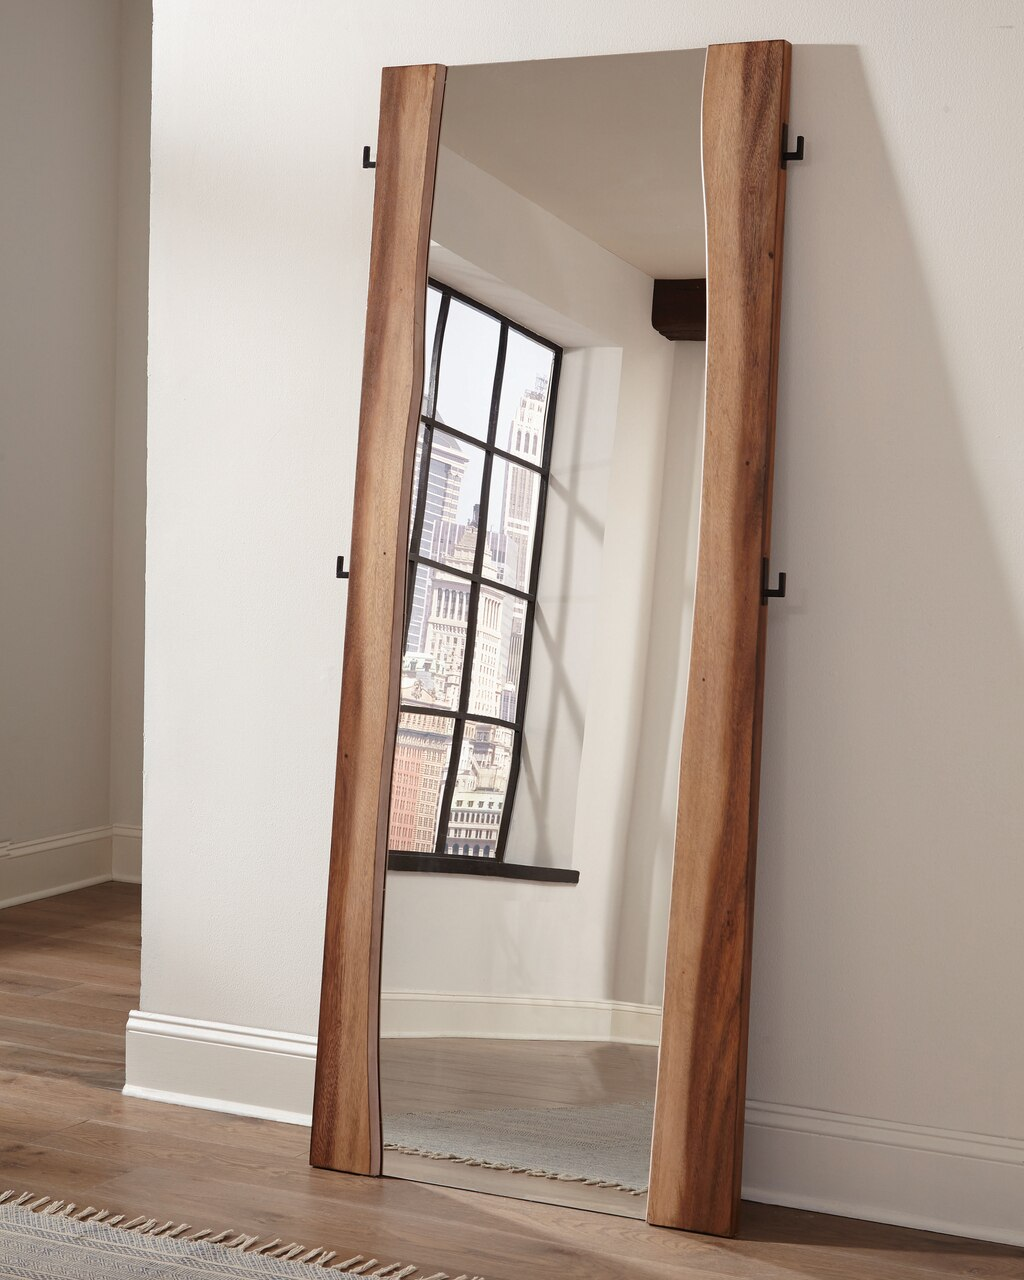 coaster-furniture-winslow-smoky-walnut-leaner-mirror-live-edge-standing-floor-06719.1603592013.1280.1280.jpg